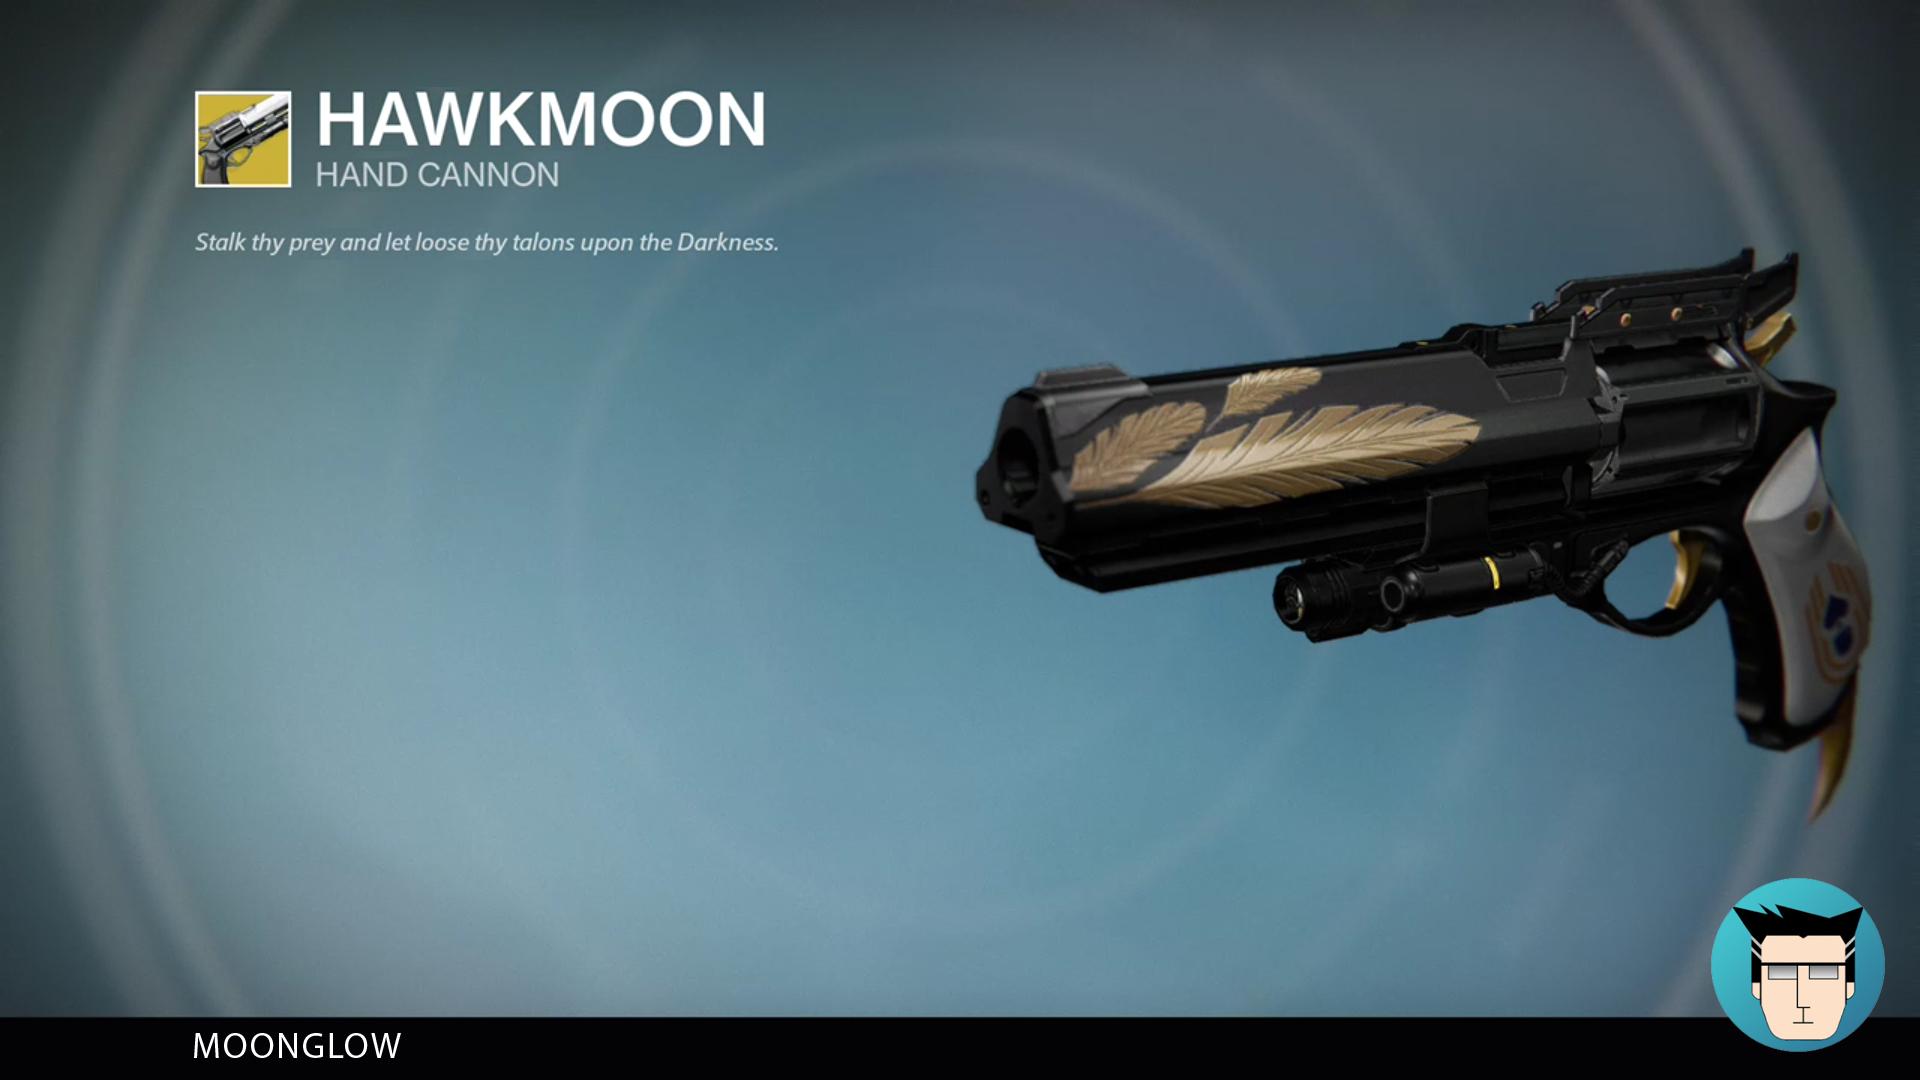 HAWKMOON | MOONGLOW